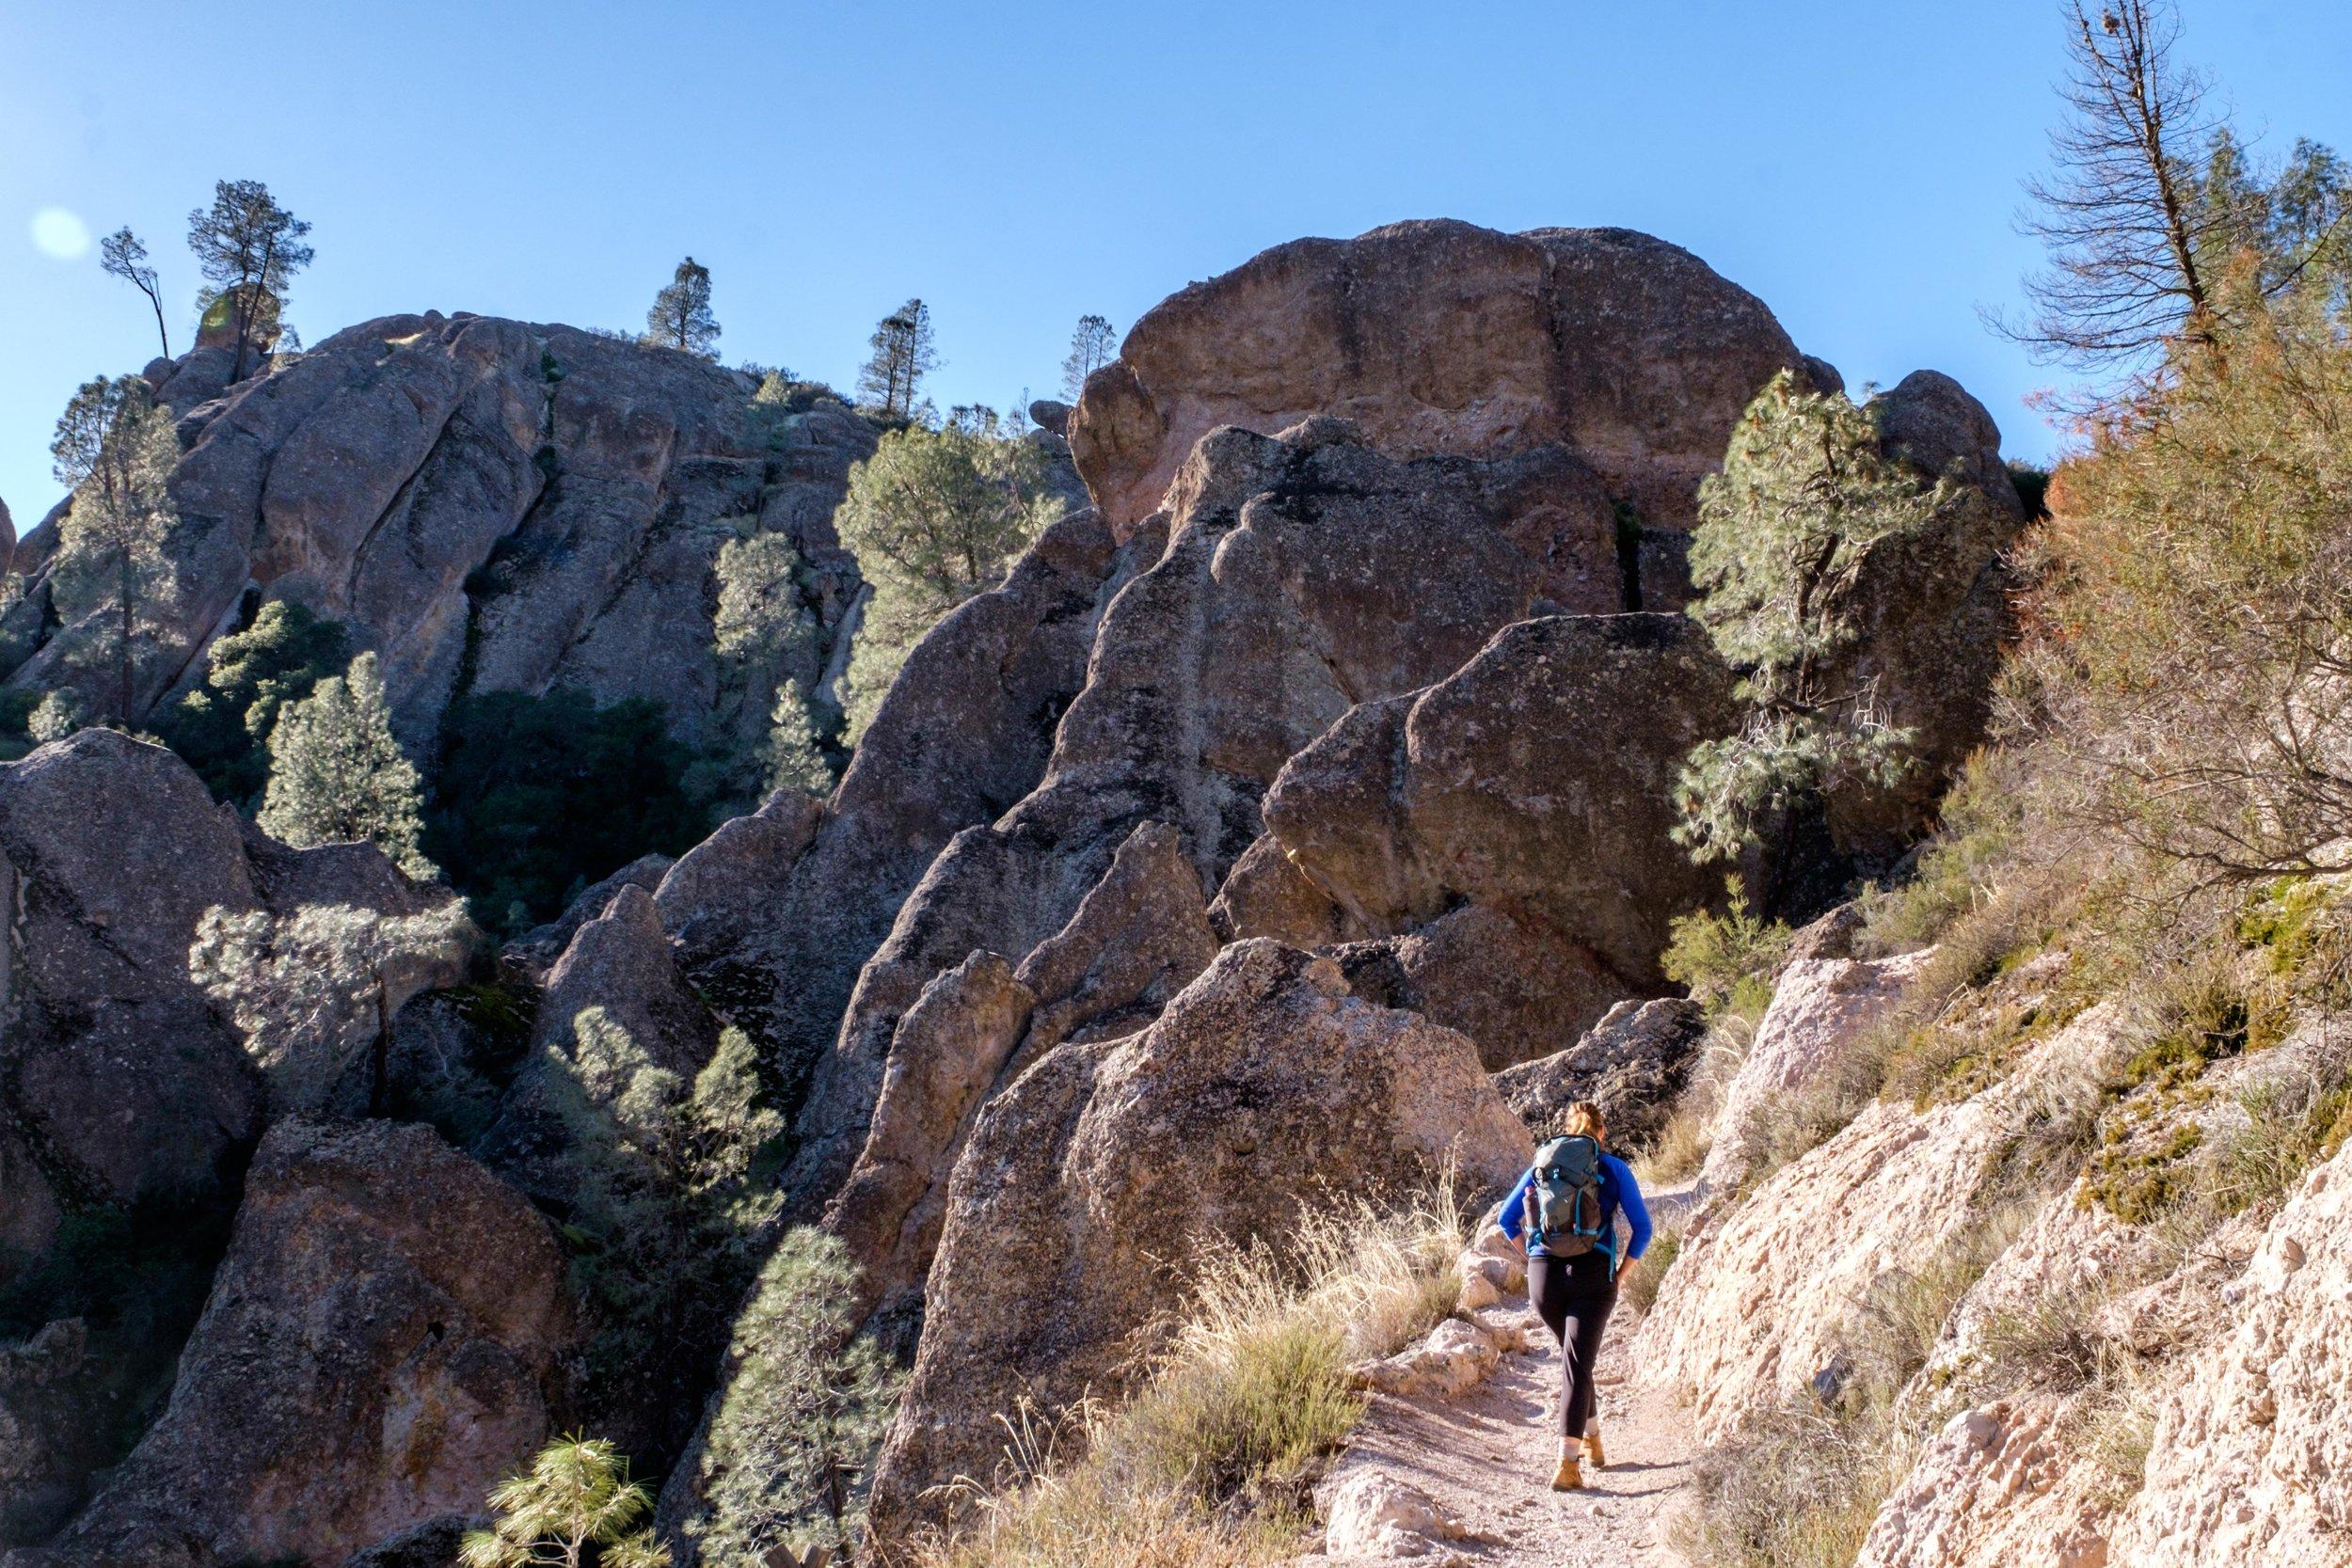 20161226-JI-Pinnacles National Park-_DSF0194.jpg